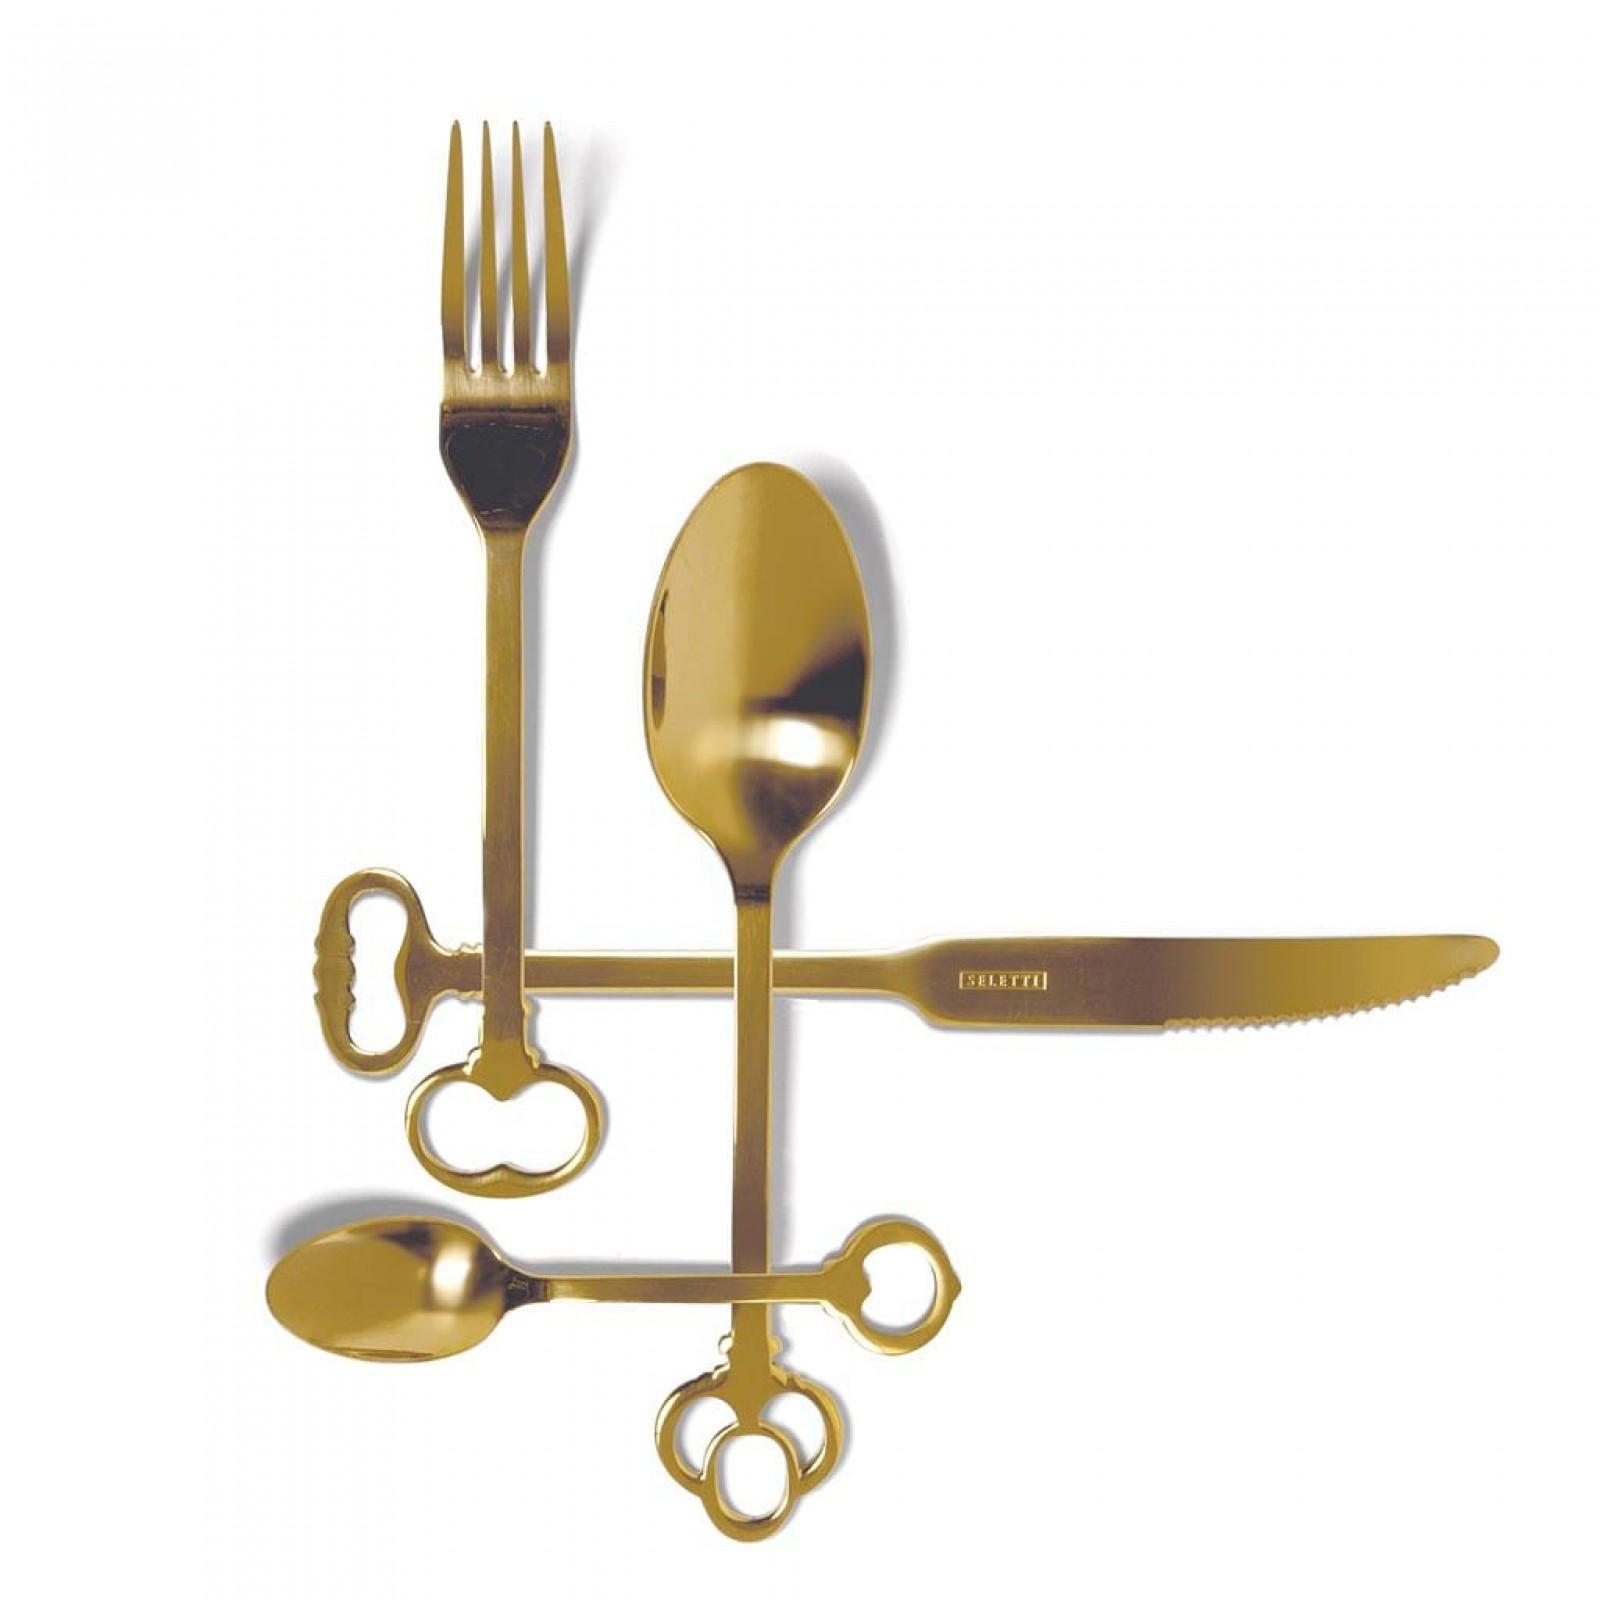 Keytlery Gold Cutlery Set 24 pieces - Seletti